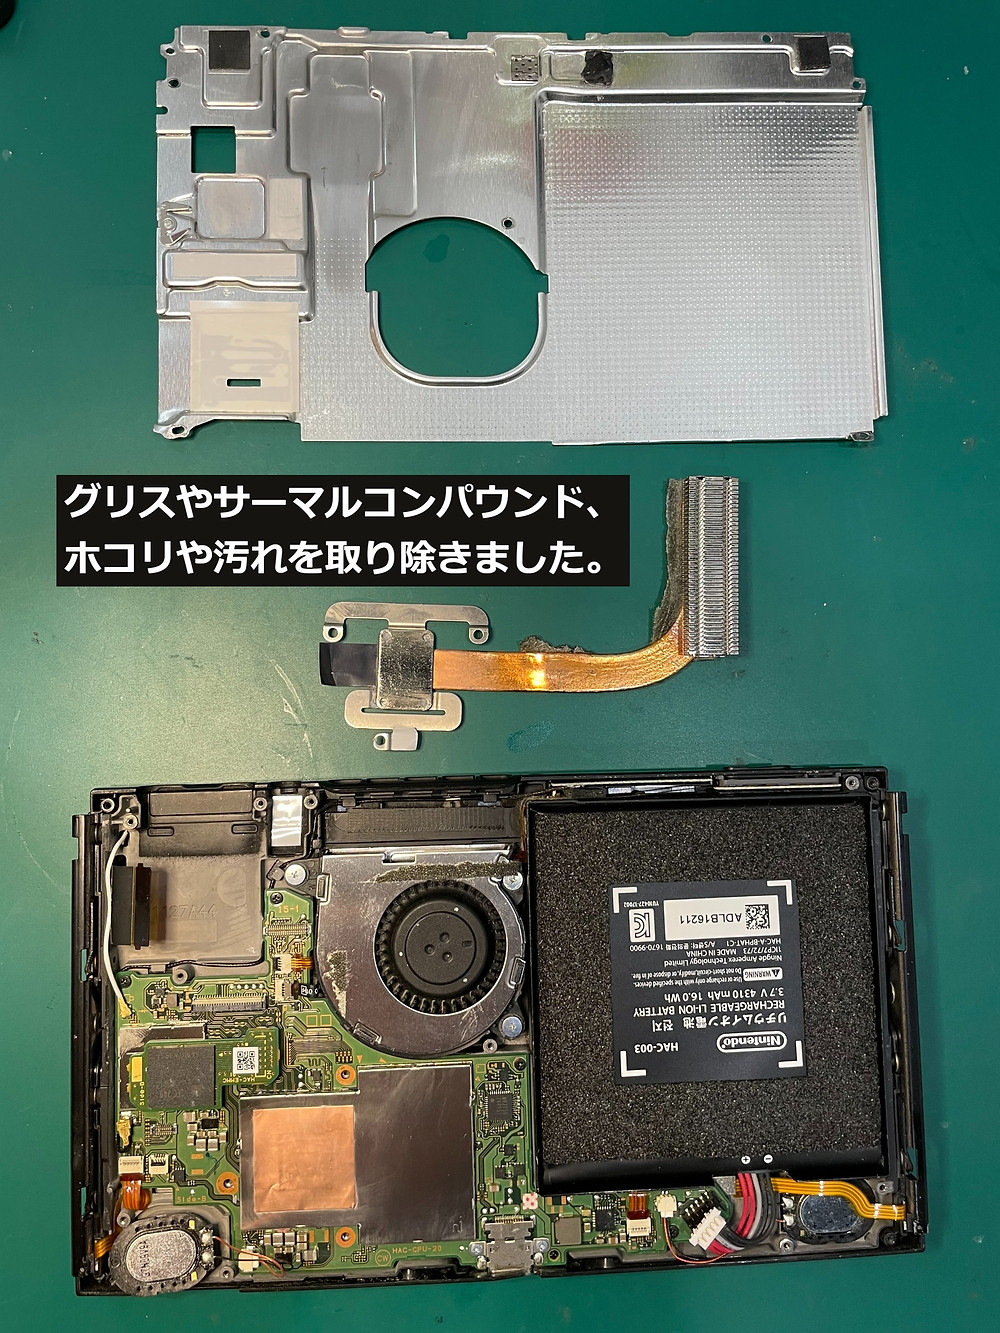 Nintendo Switchは定期的な内部クリーニングがおすすめ!